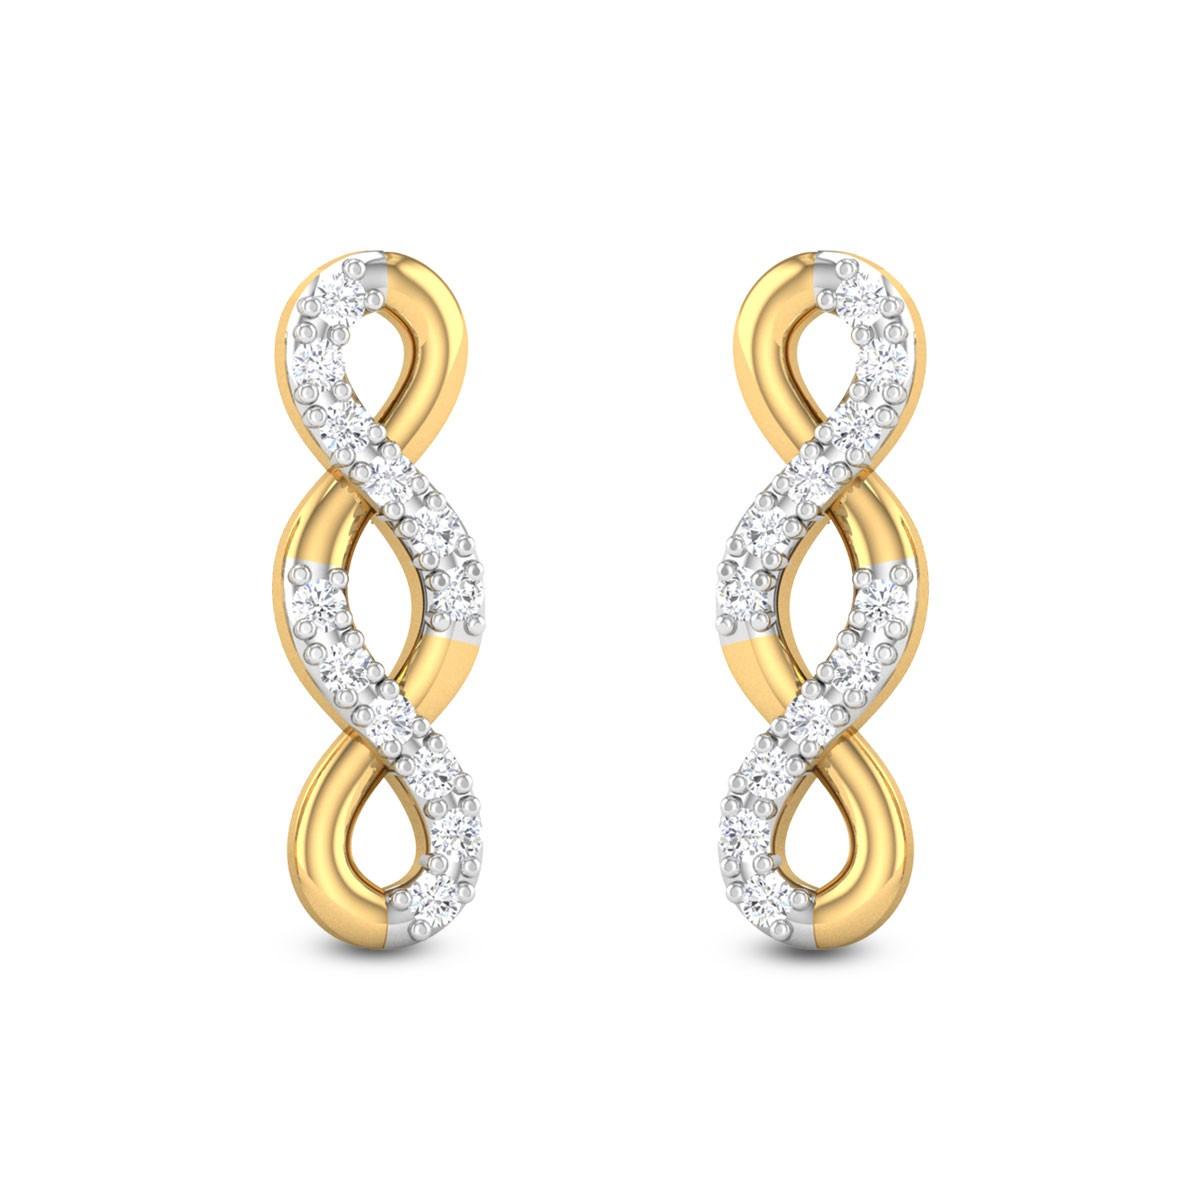 Golden Ambrosia Diamond Earrings